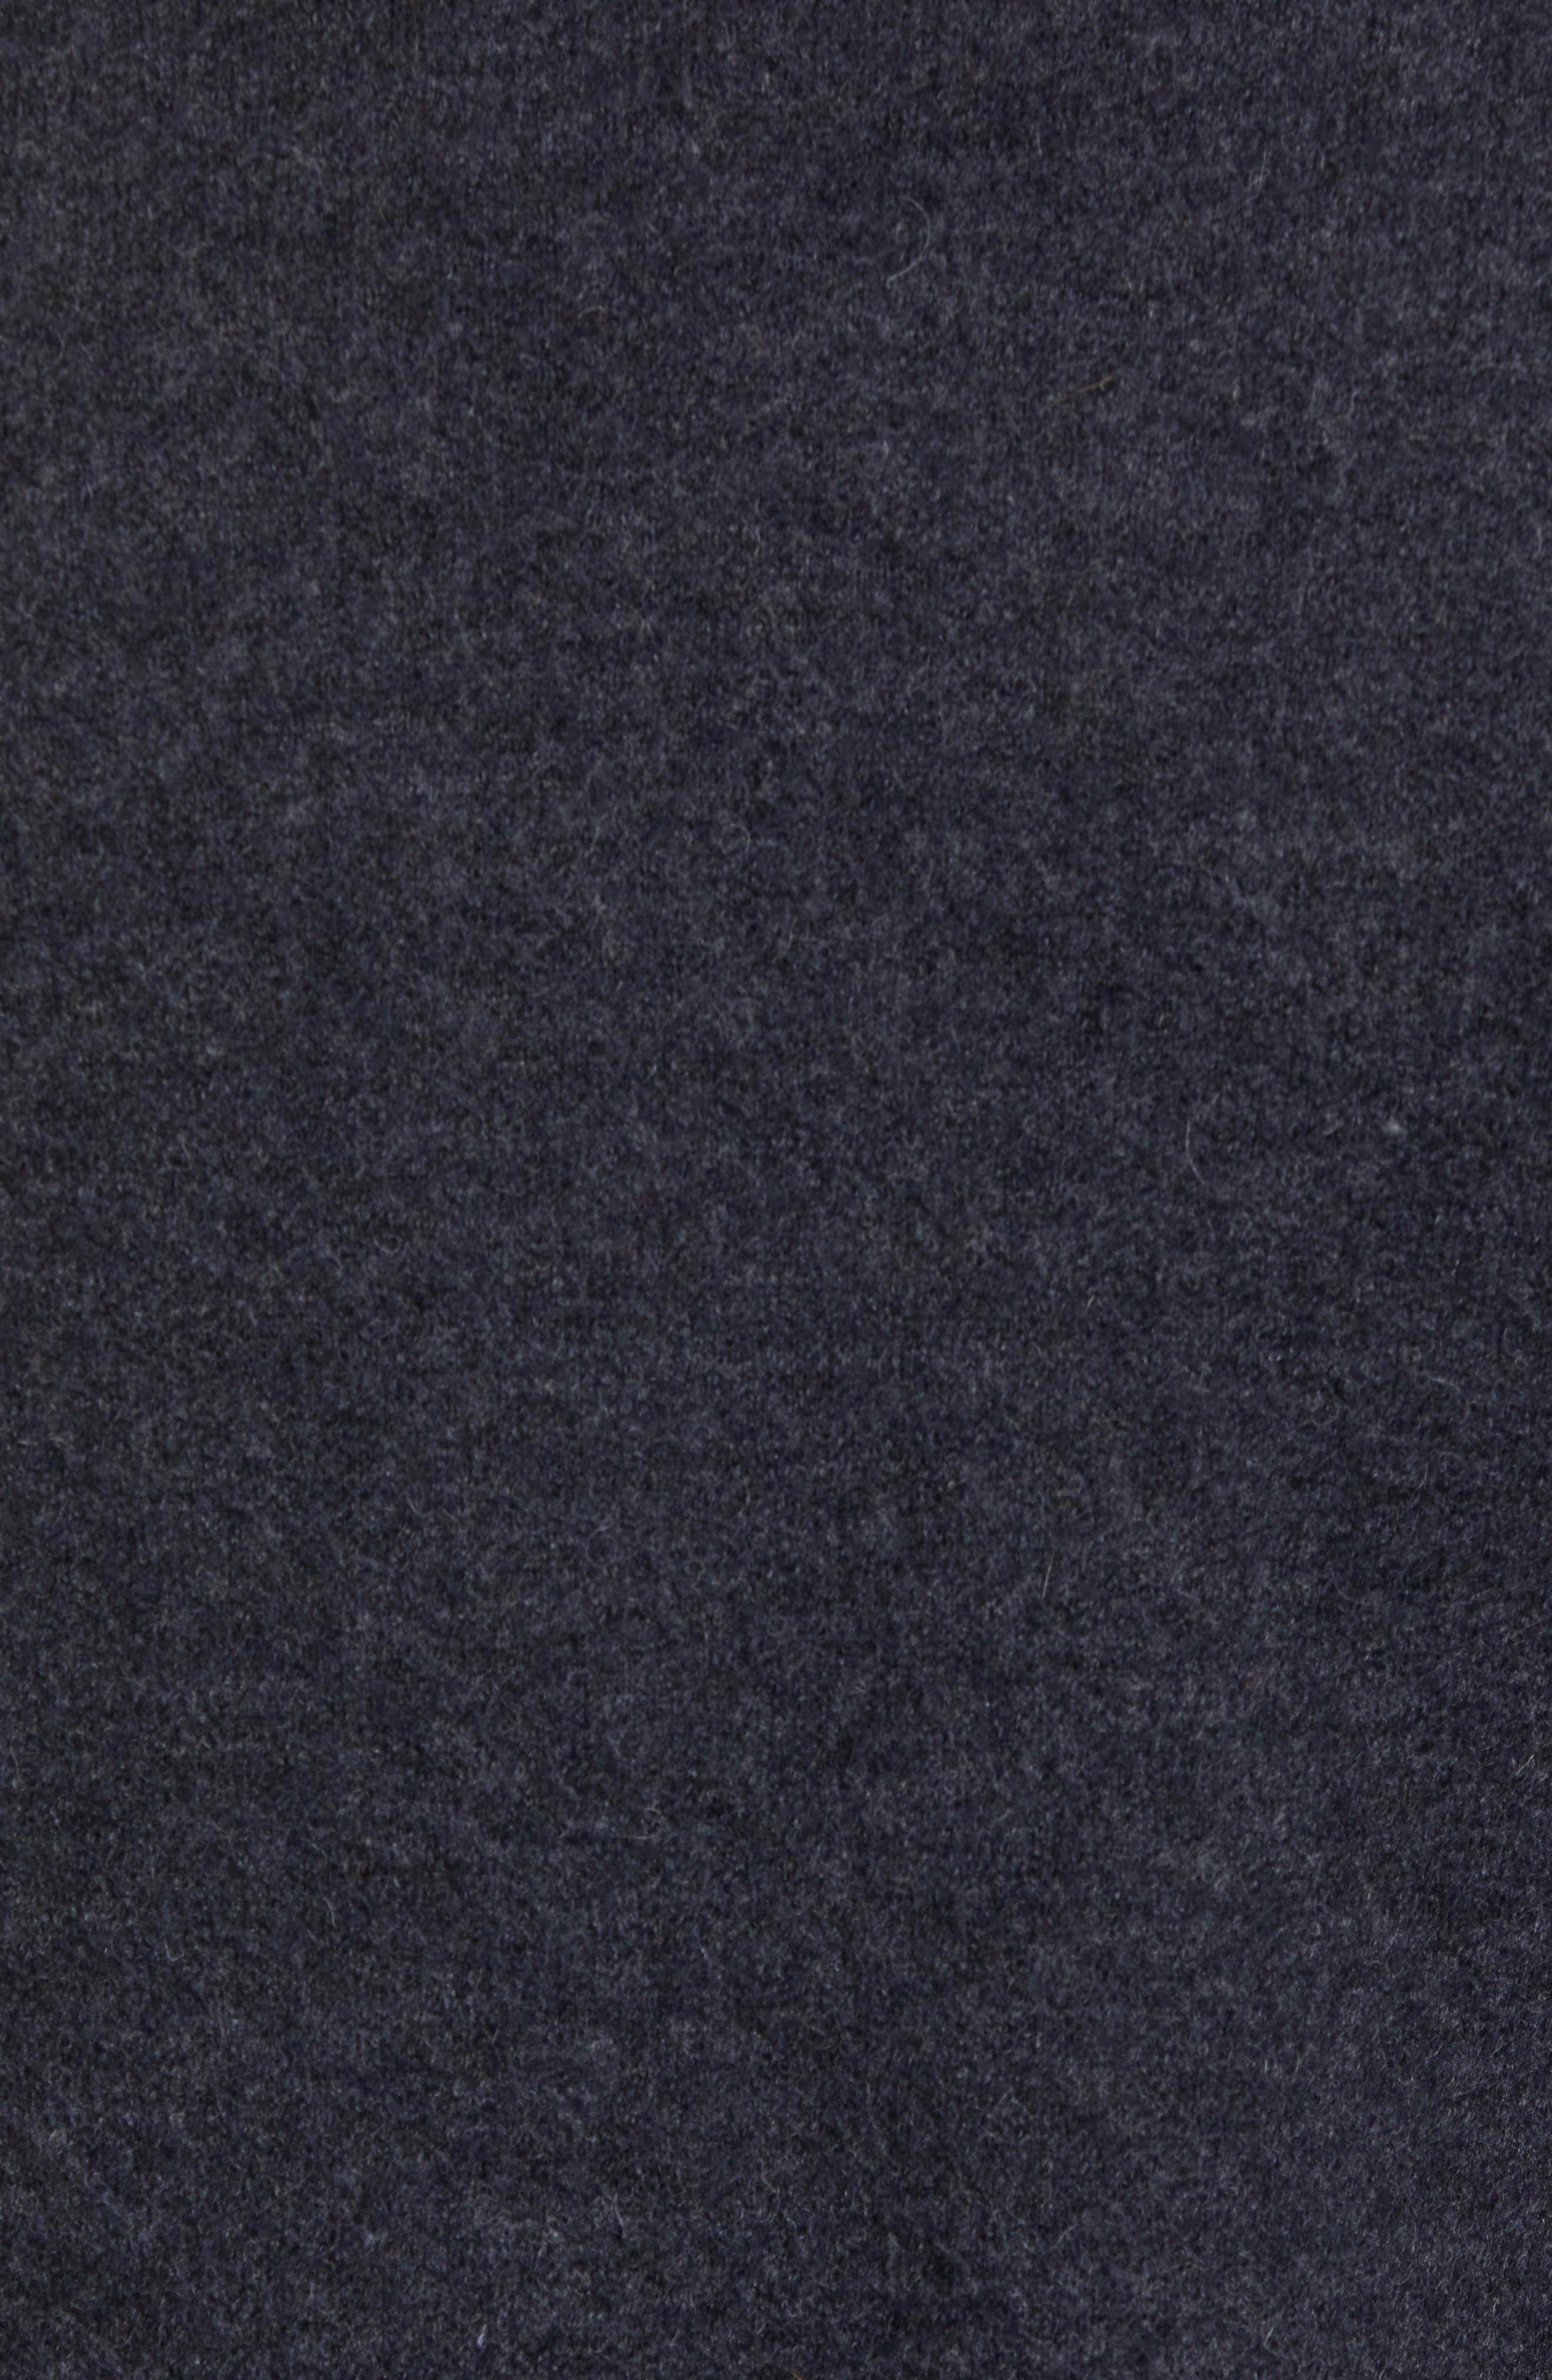 Boiled Wool Blazer,                             Alternate thumbnail 5, color,                             CHARCOAL MELANGE